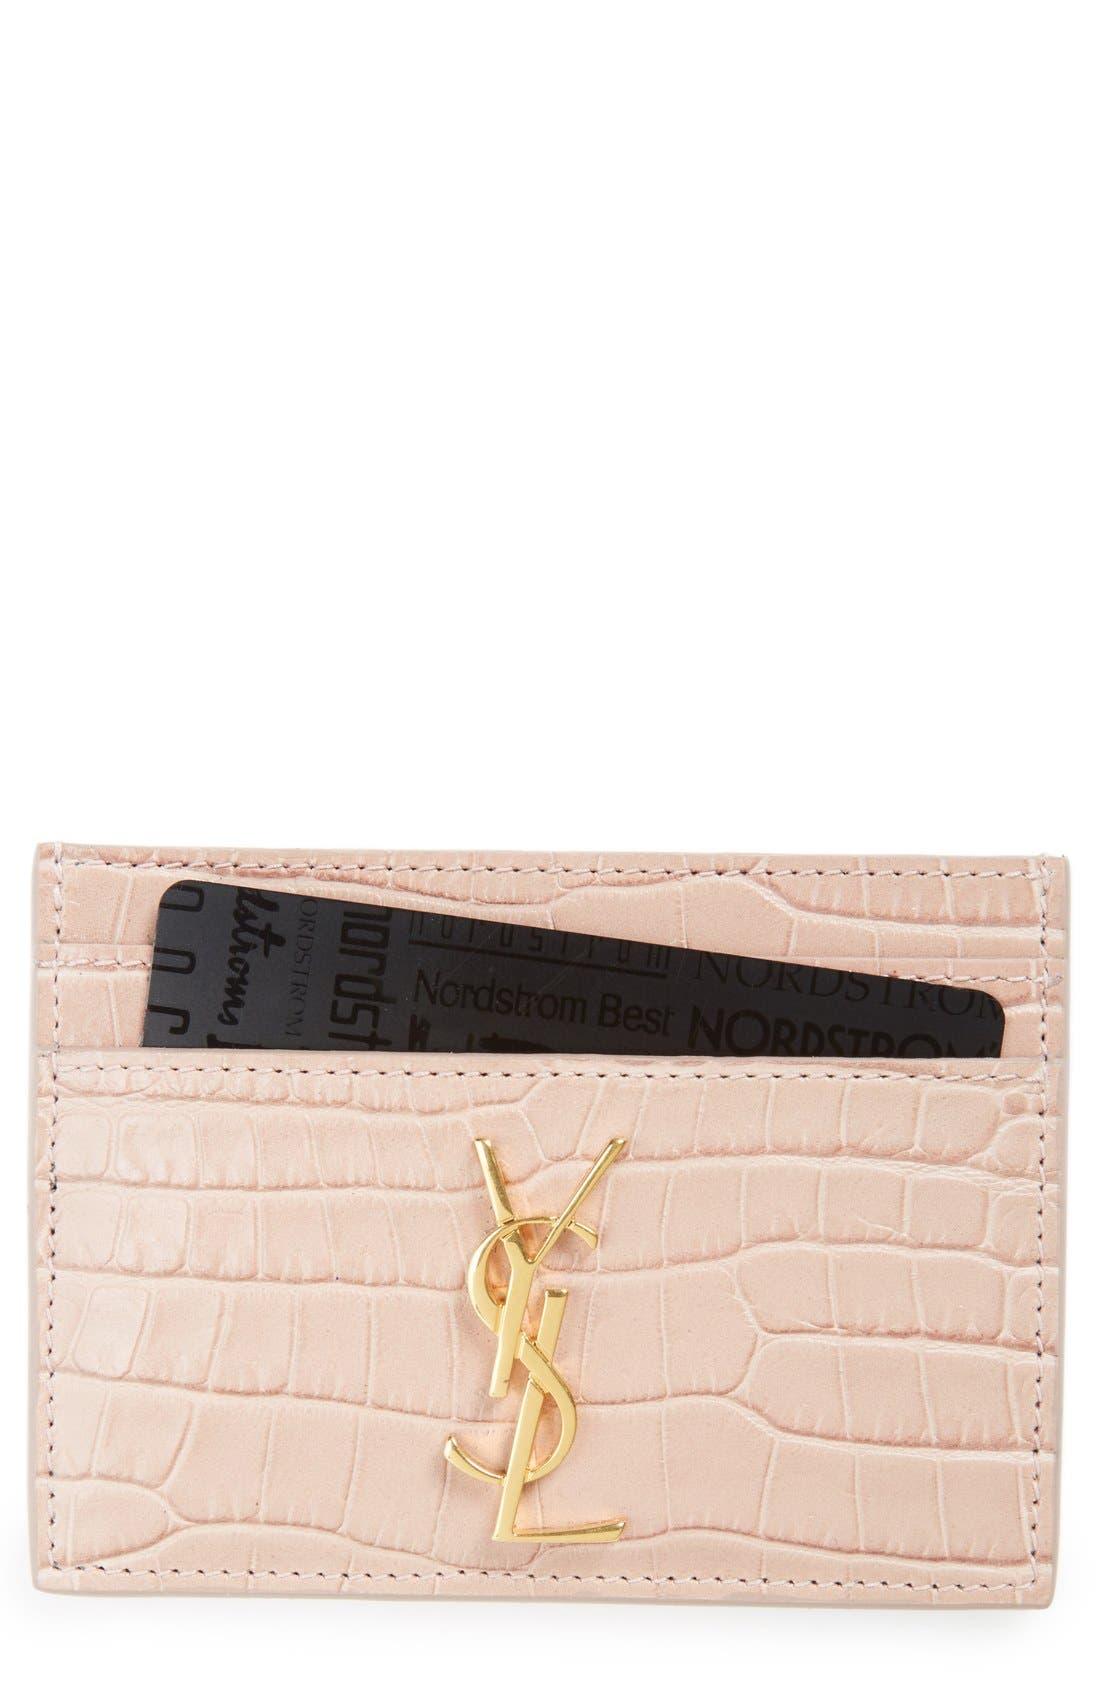 Alternate Image 1 Selected - Saint Laurent Monogram Croc Embossed Leather Card Case